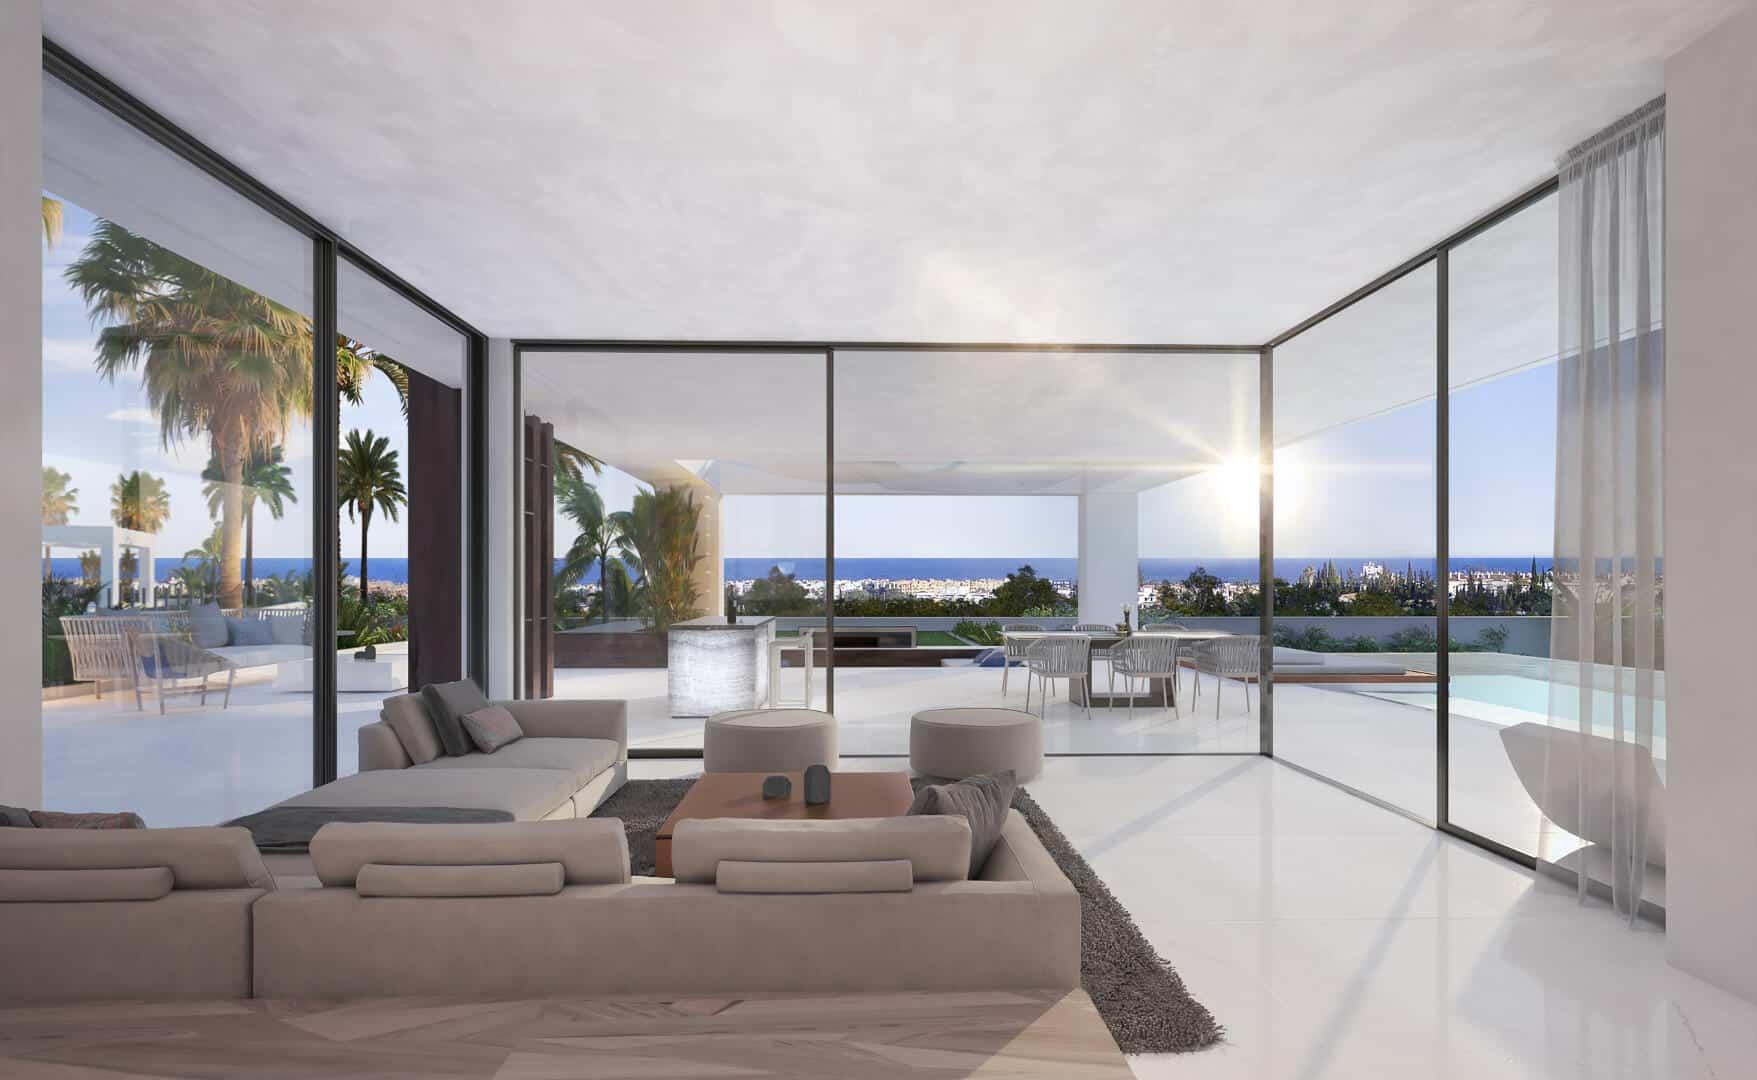 Velvet new release development villas sea views Estepona for sale _Realista Quality Properties Marbella